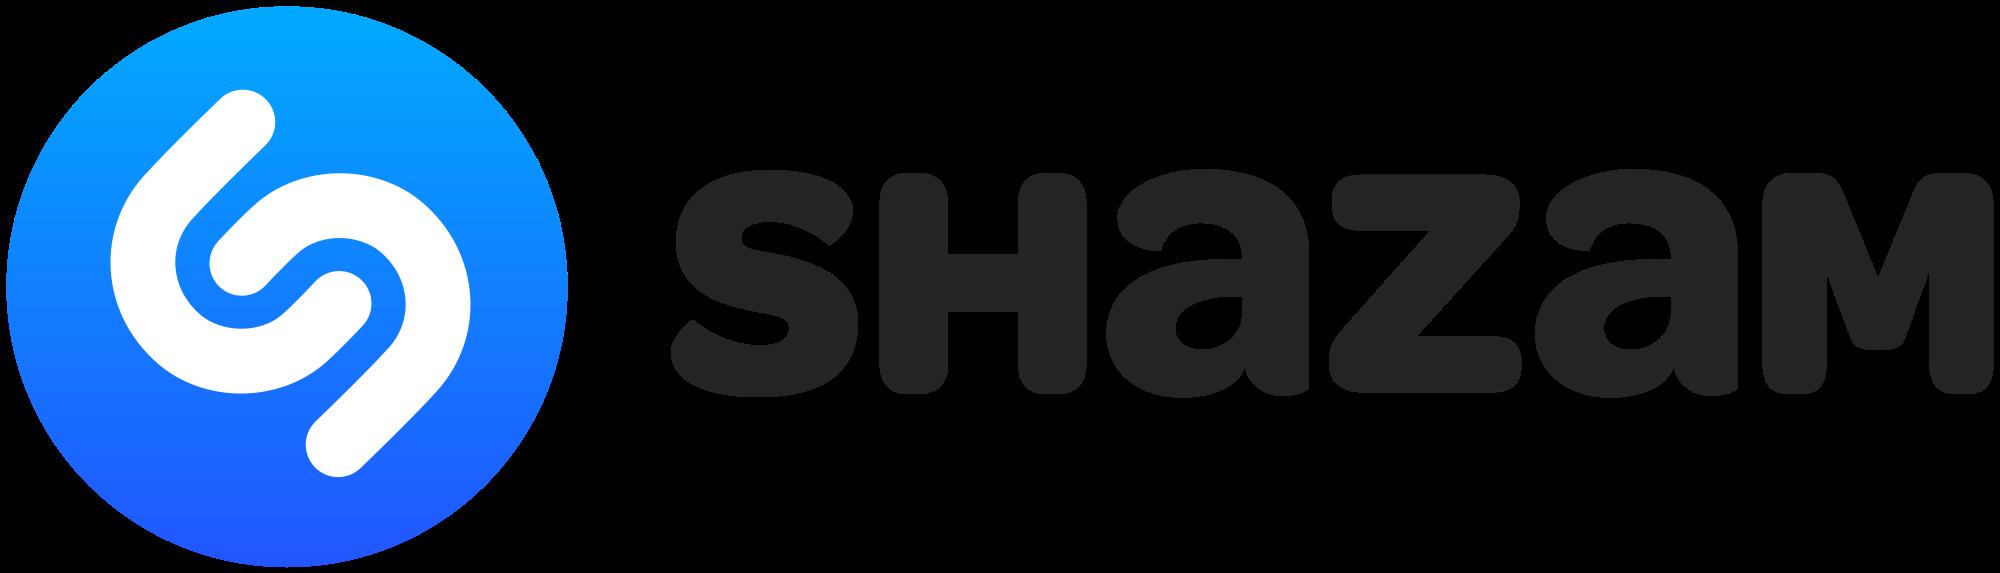 https://routecatering.co.uk/wp-content/uploads/2018/02/Shazam_logo.png